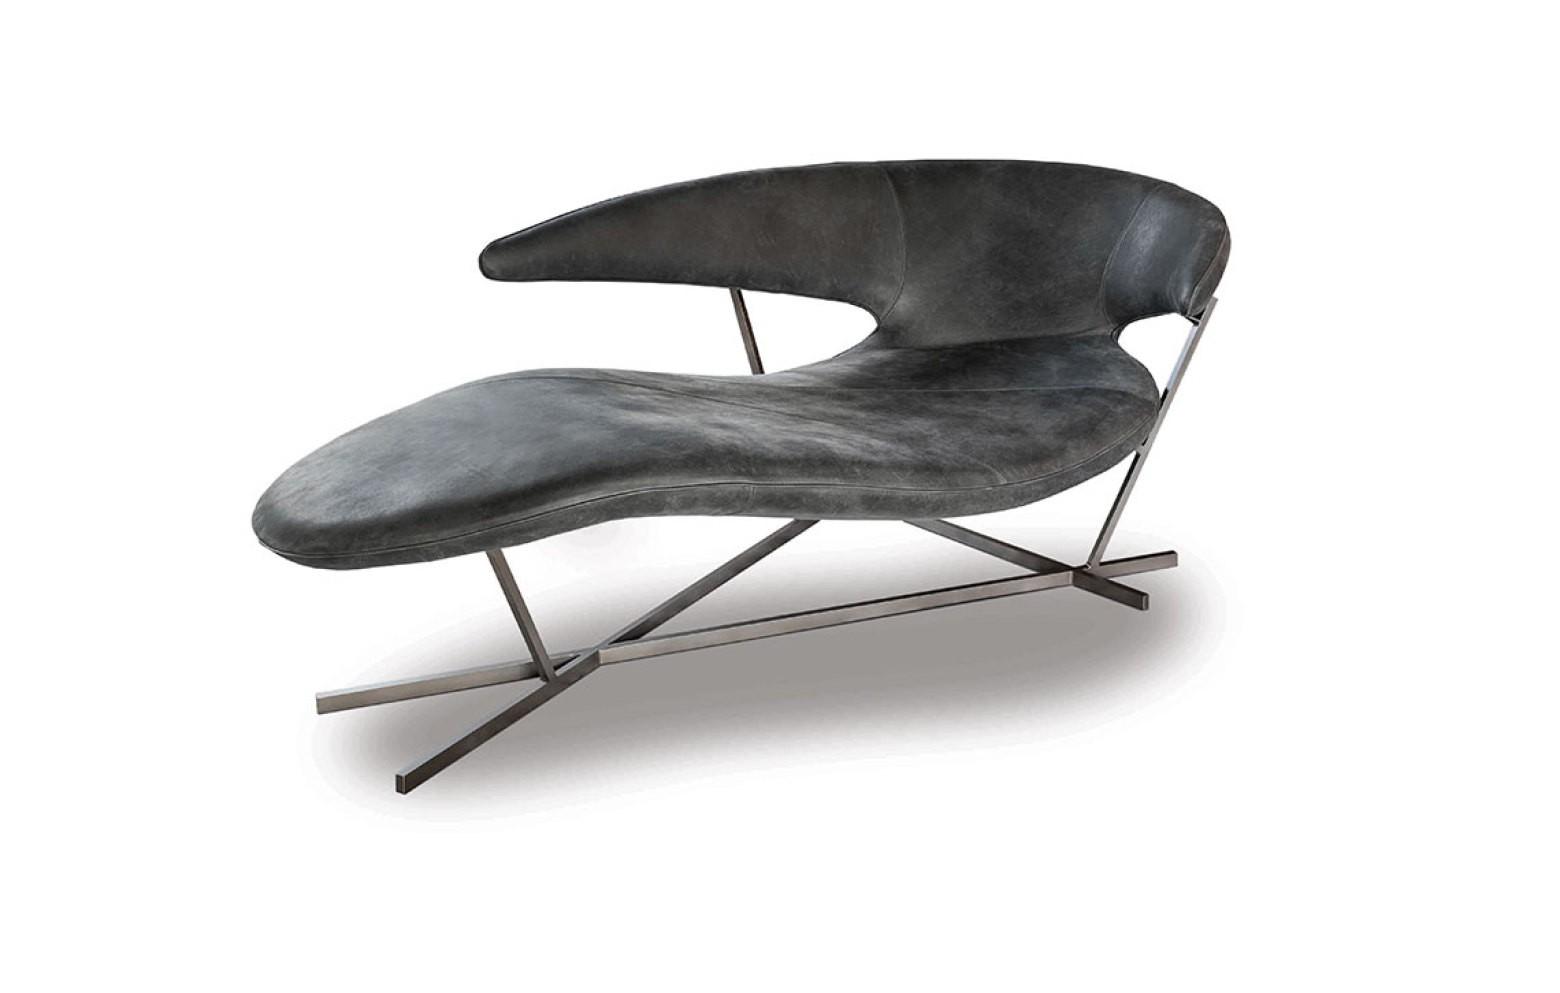 MANTA Sessel Sessel & Liegen Polstermöbel